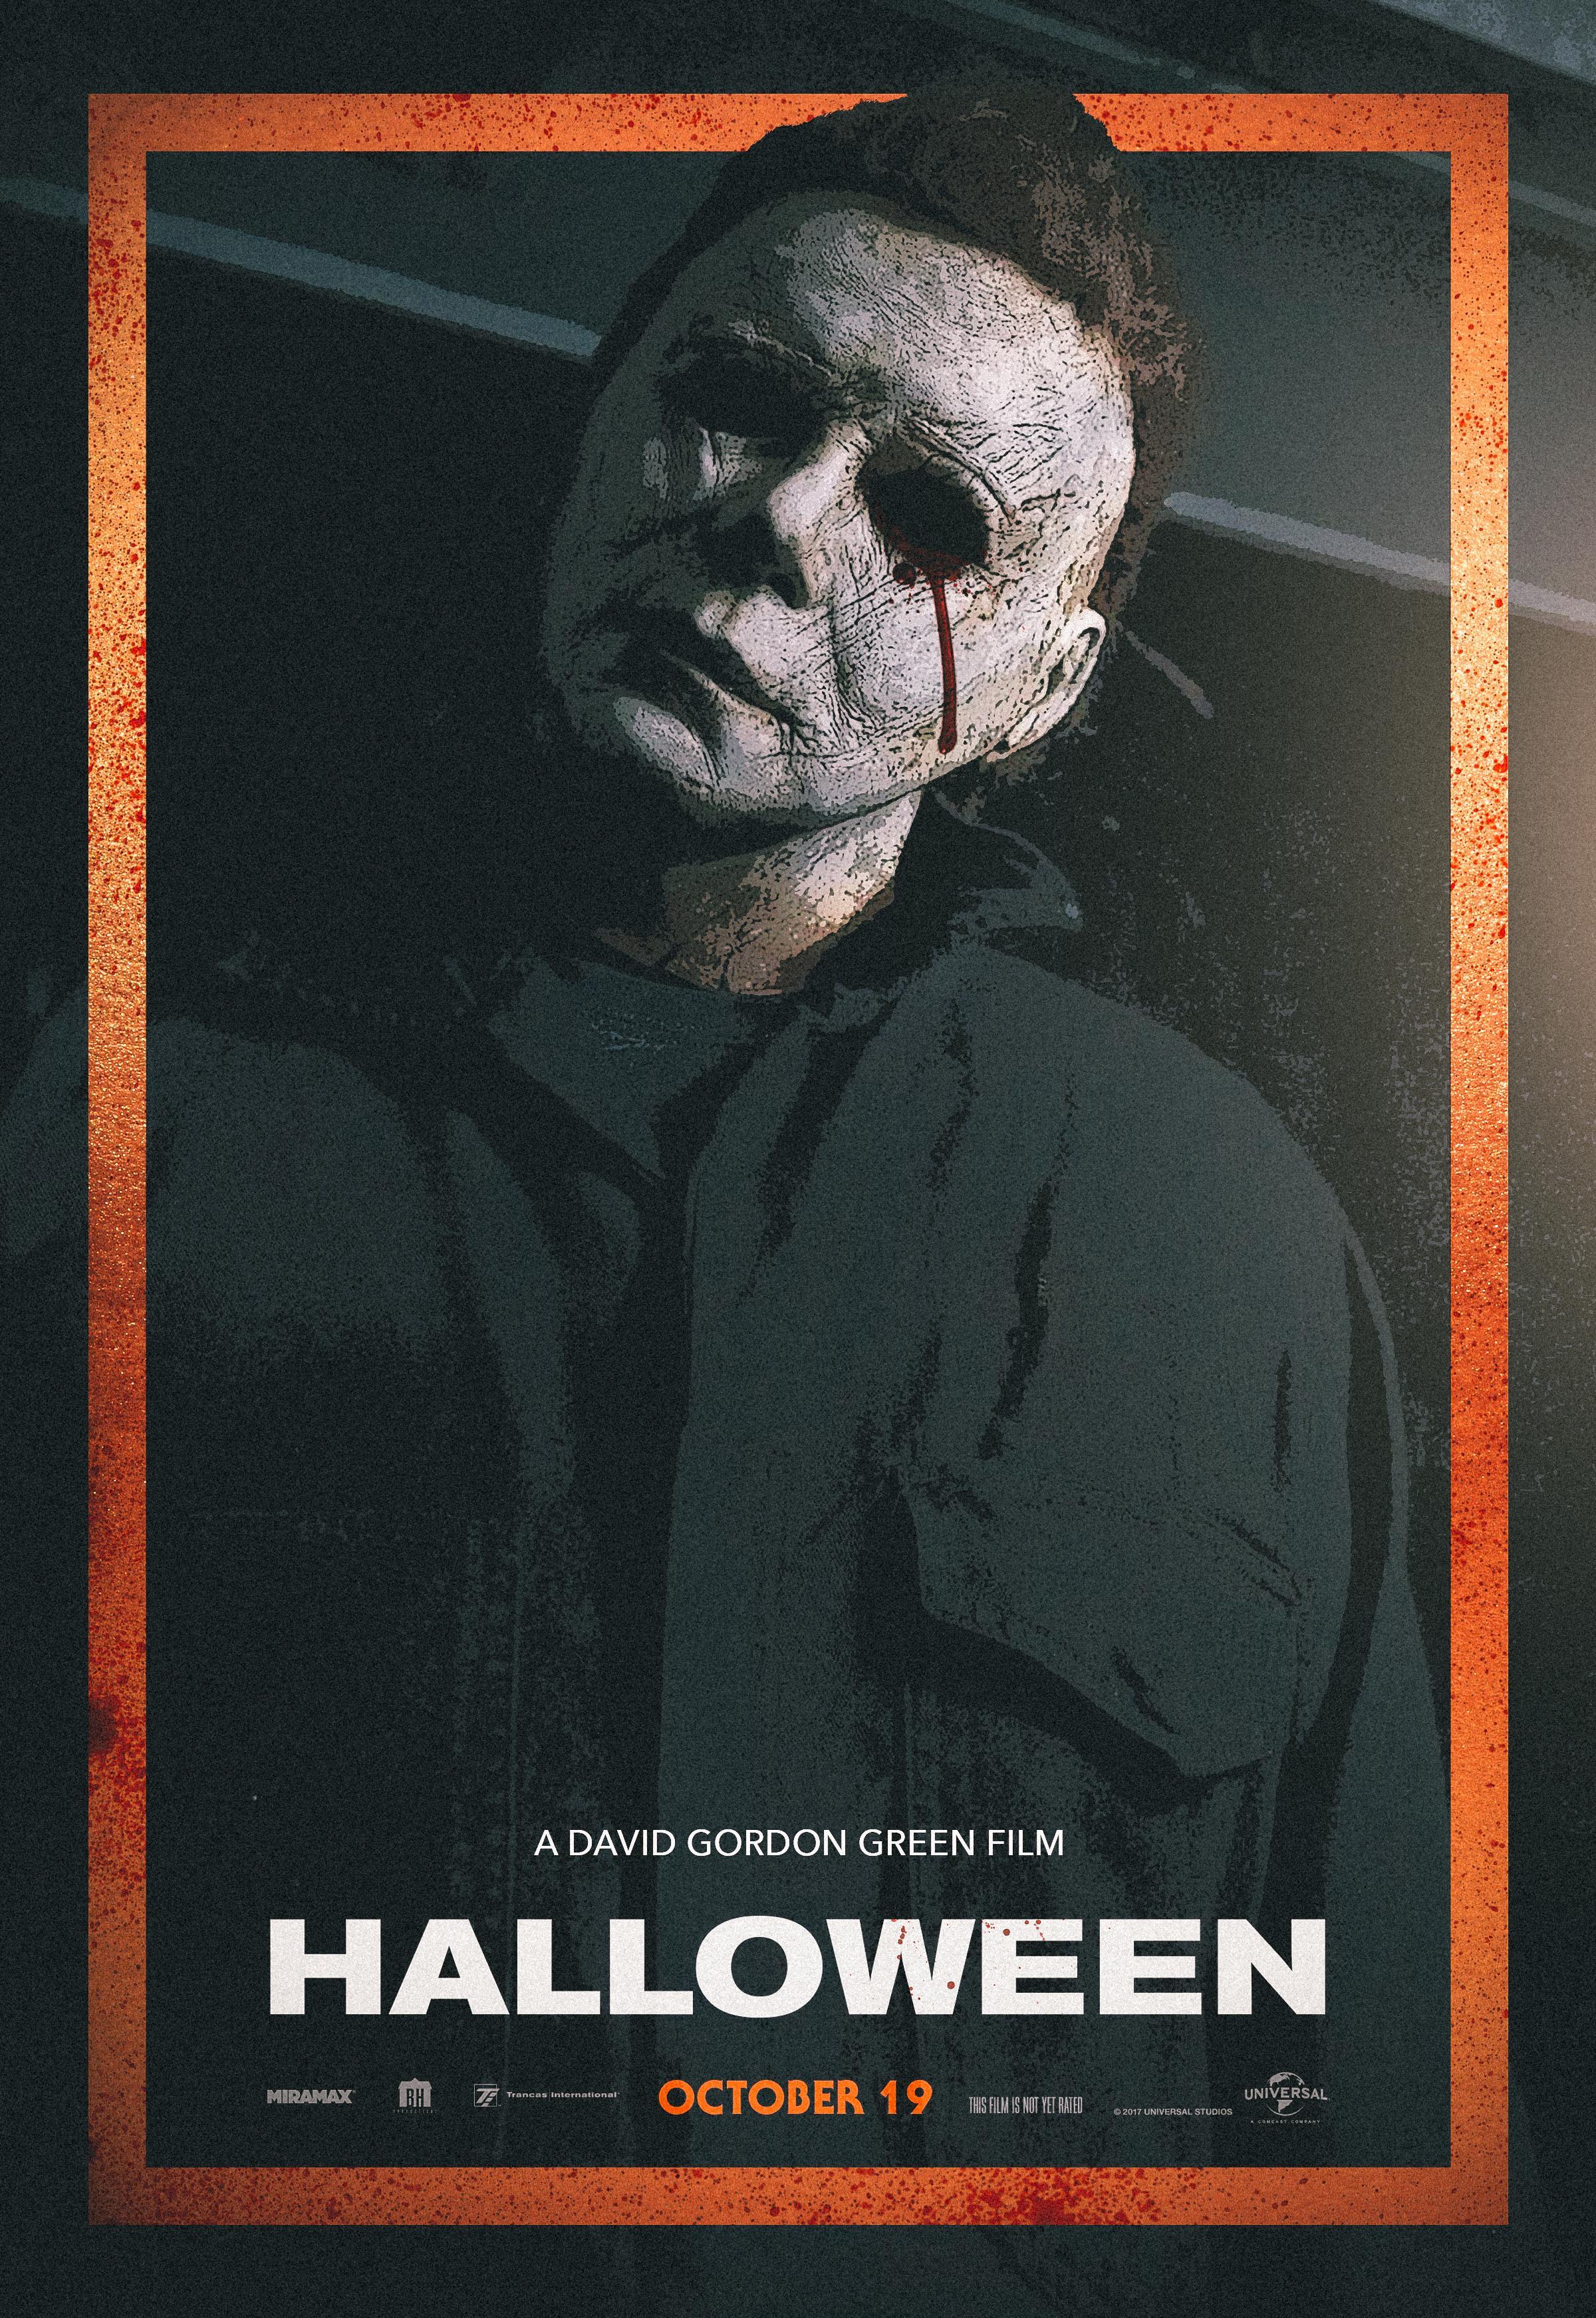 halloween movie poster 2018 movies